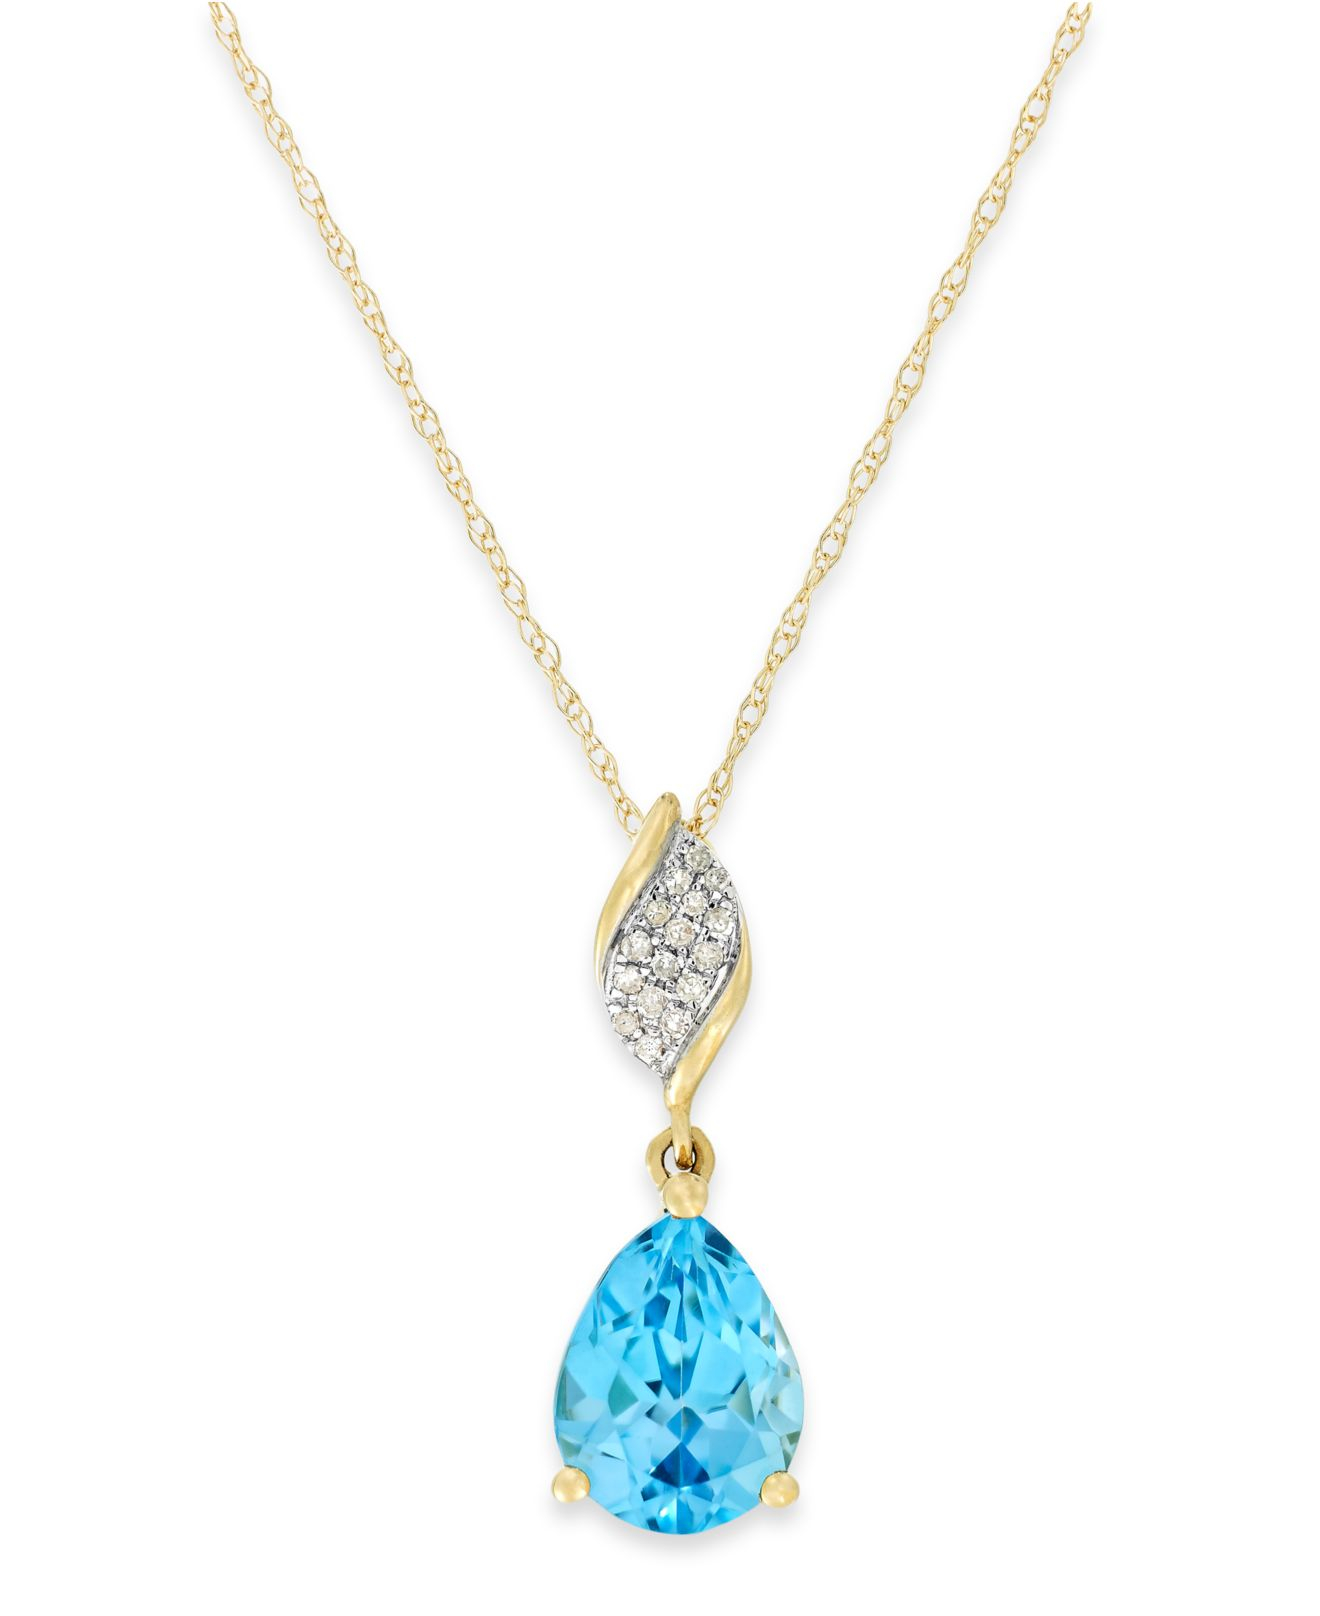 lyst macy 39 s 14k white gold necklace blue topaz 6 1 5. Black Bedroom Furniture Sets. Home Design Ideas